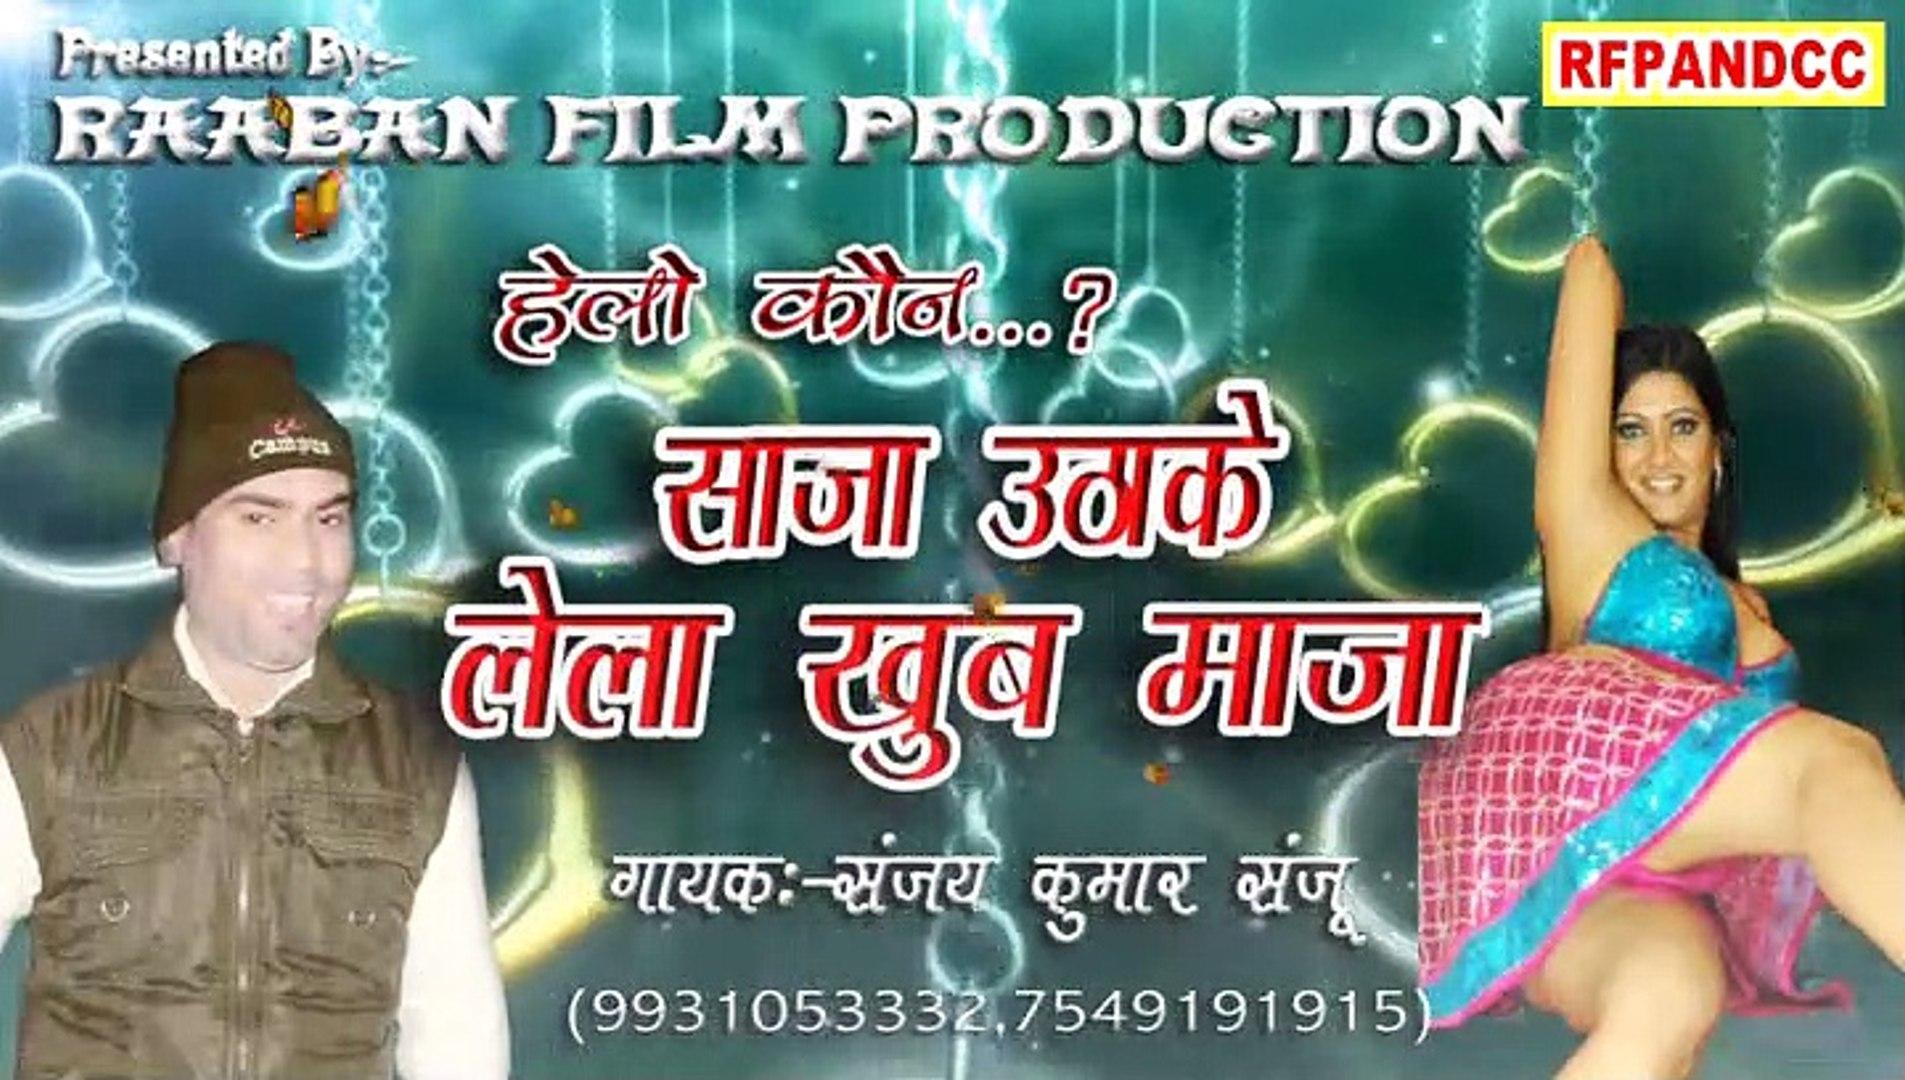 Hallo Kaun Saja Uthake Lela Khub Maja-Raaban Film Production-Sanjay Kumar Sanju